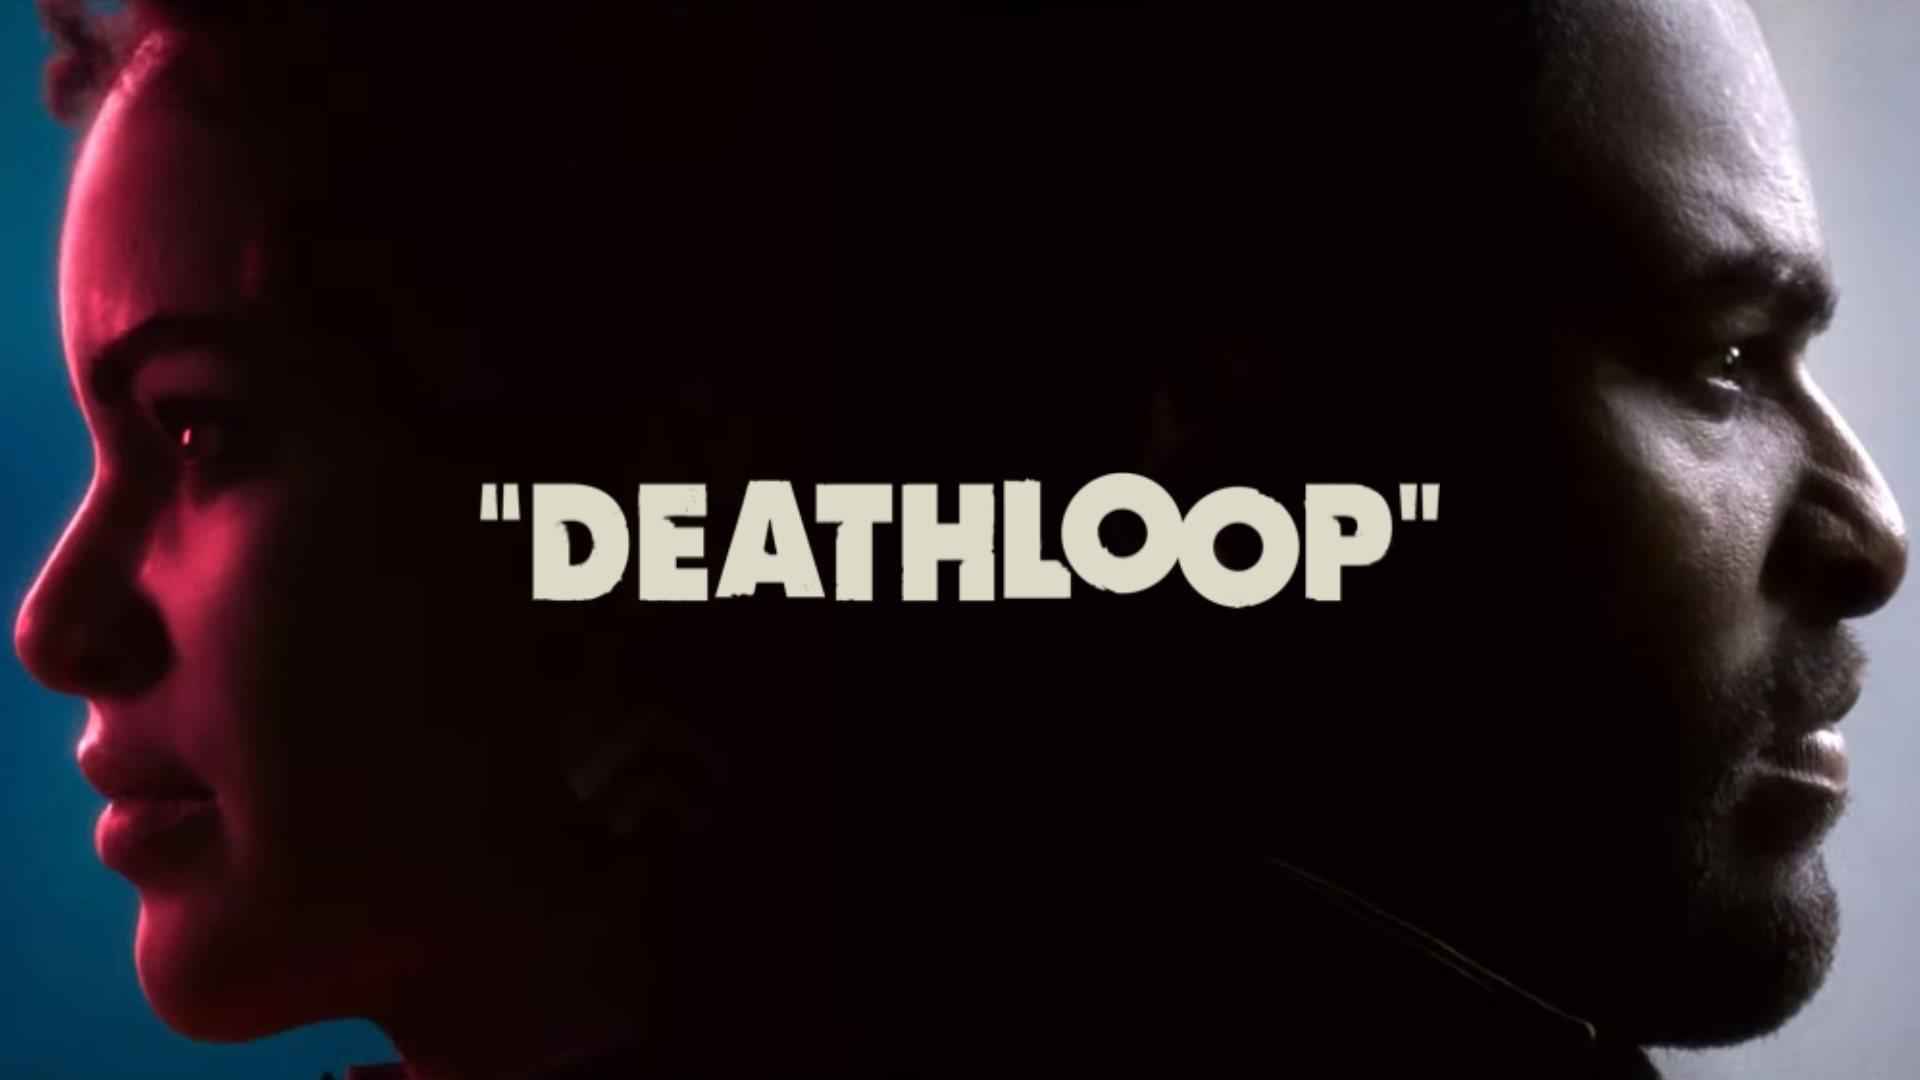 Deathloop; screenshot: rivalove